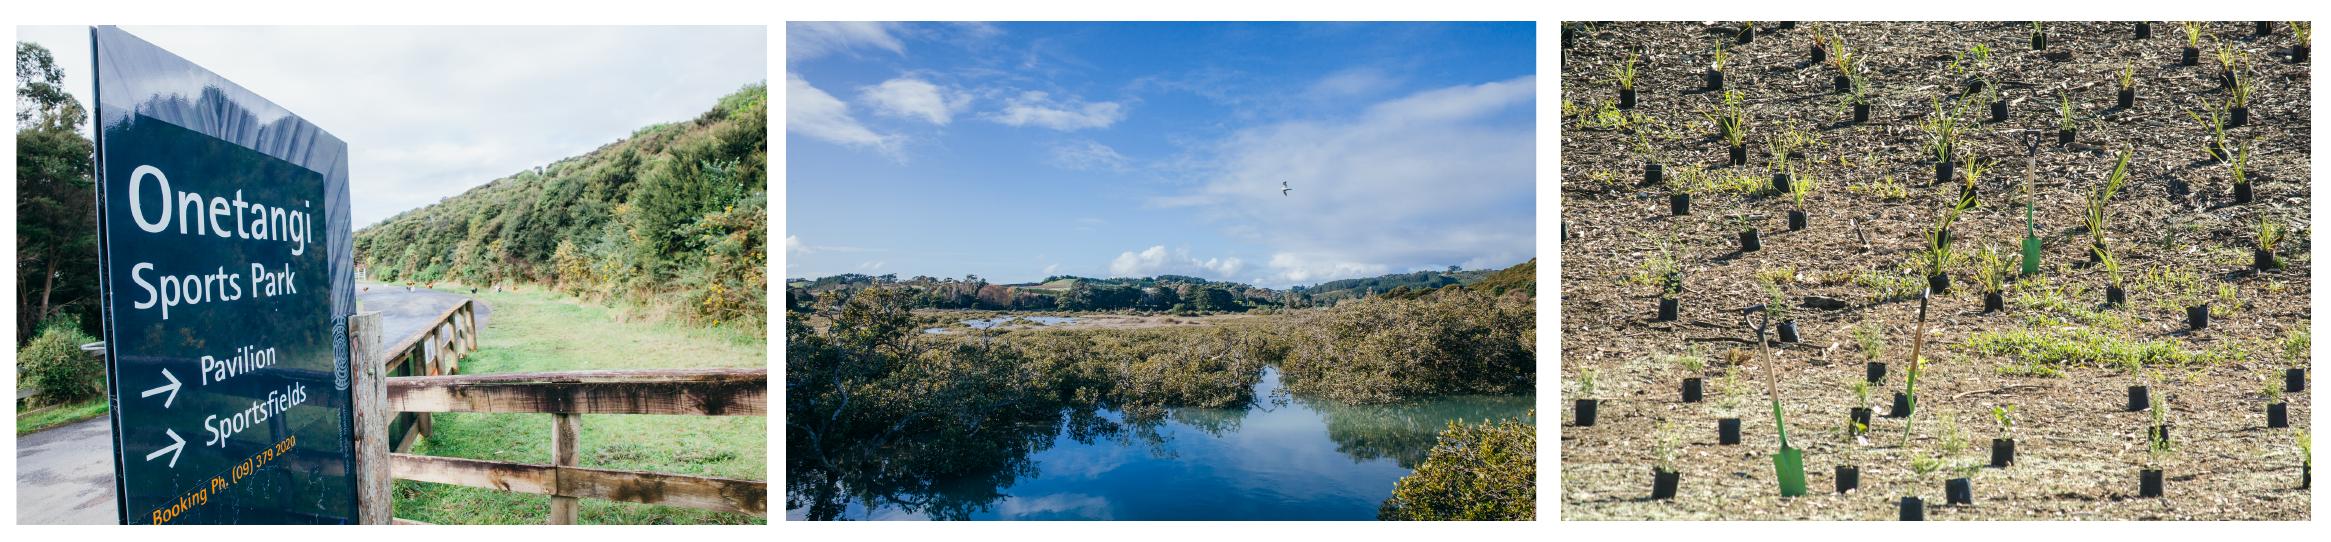 e9bf2faa 02e6 44bd bf50 abfa5b10d1e5 - Tree Planting on Waiheke Island